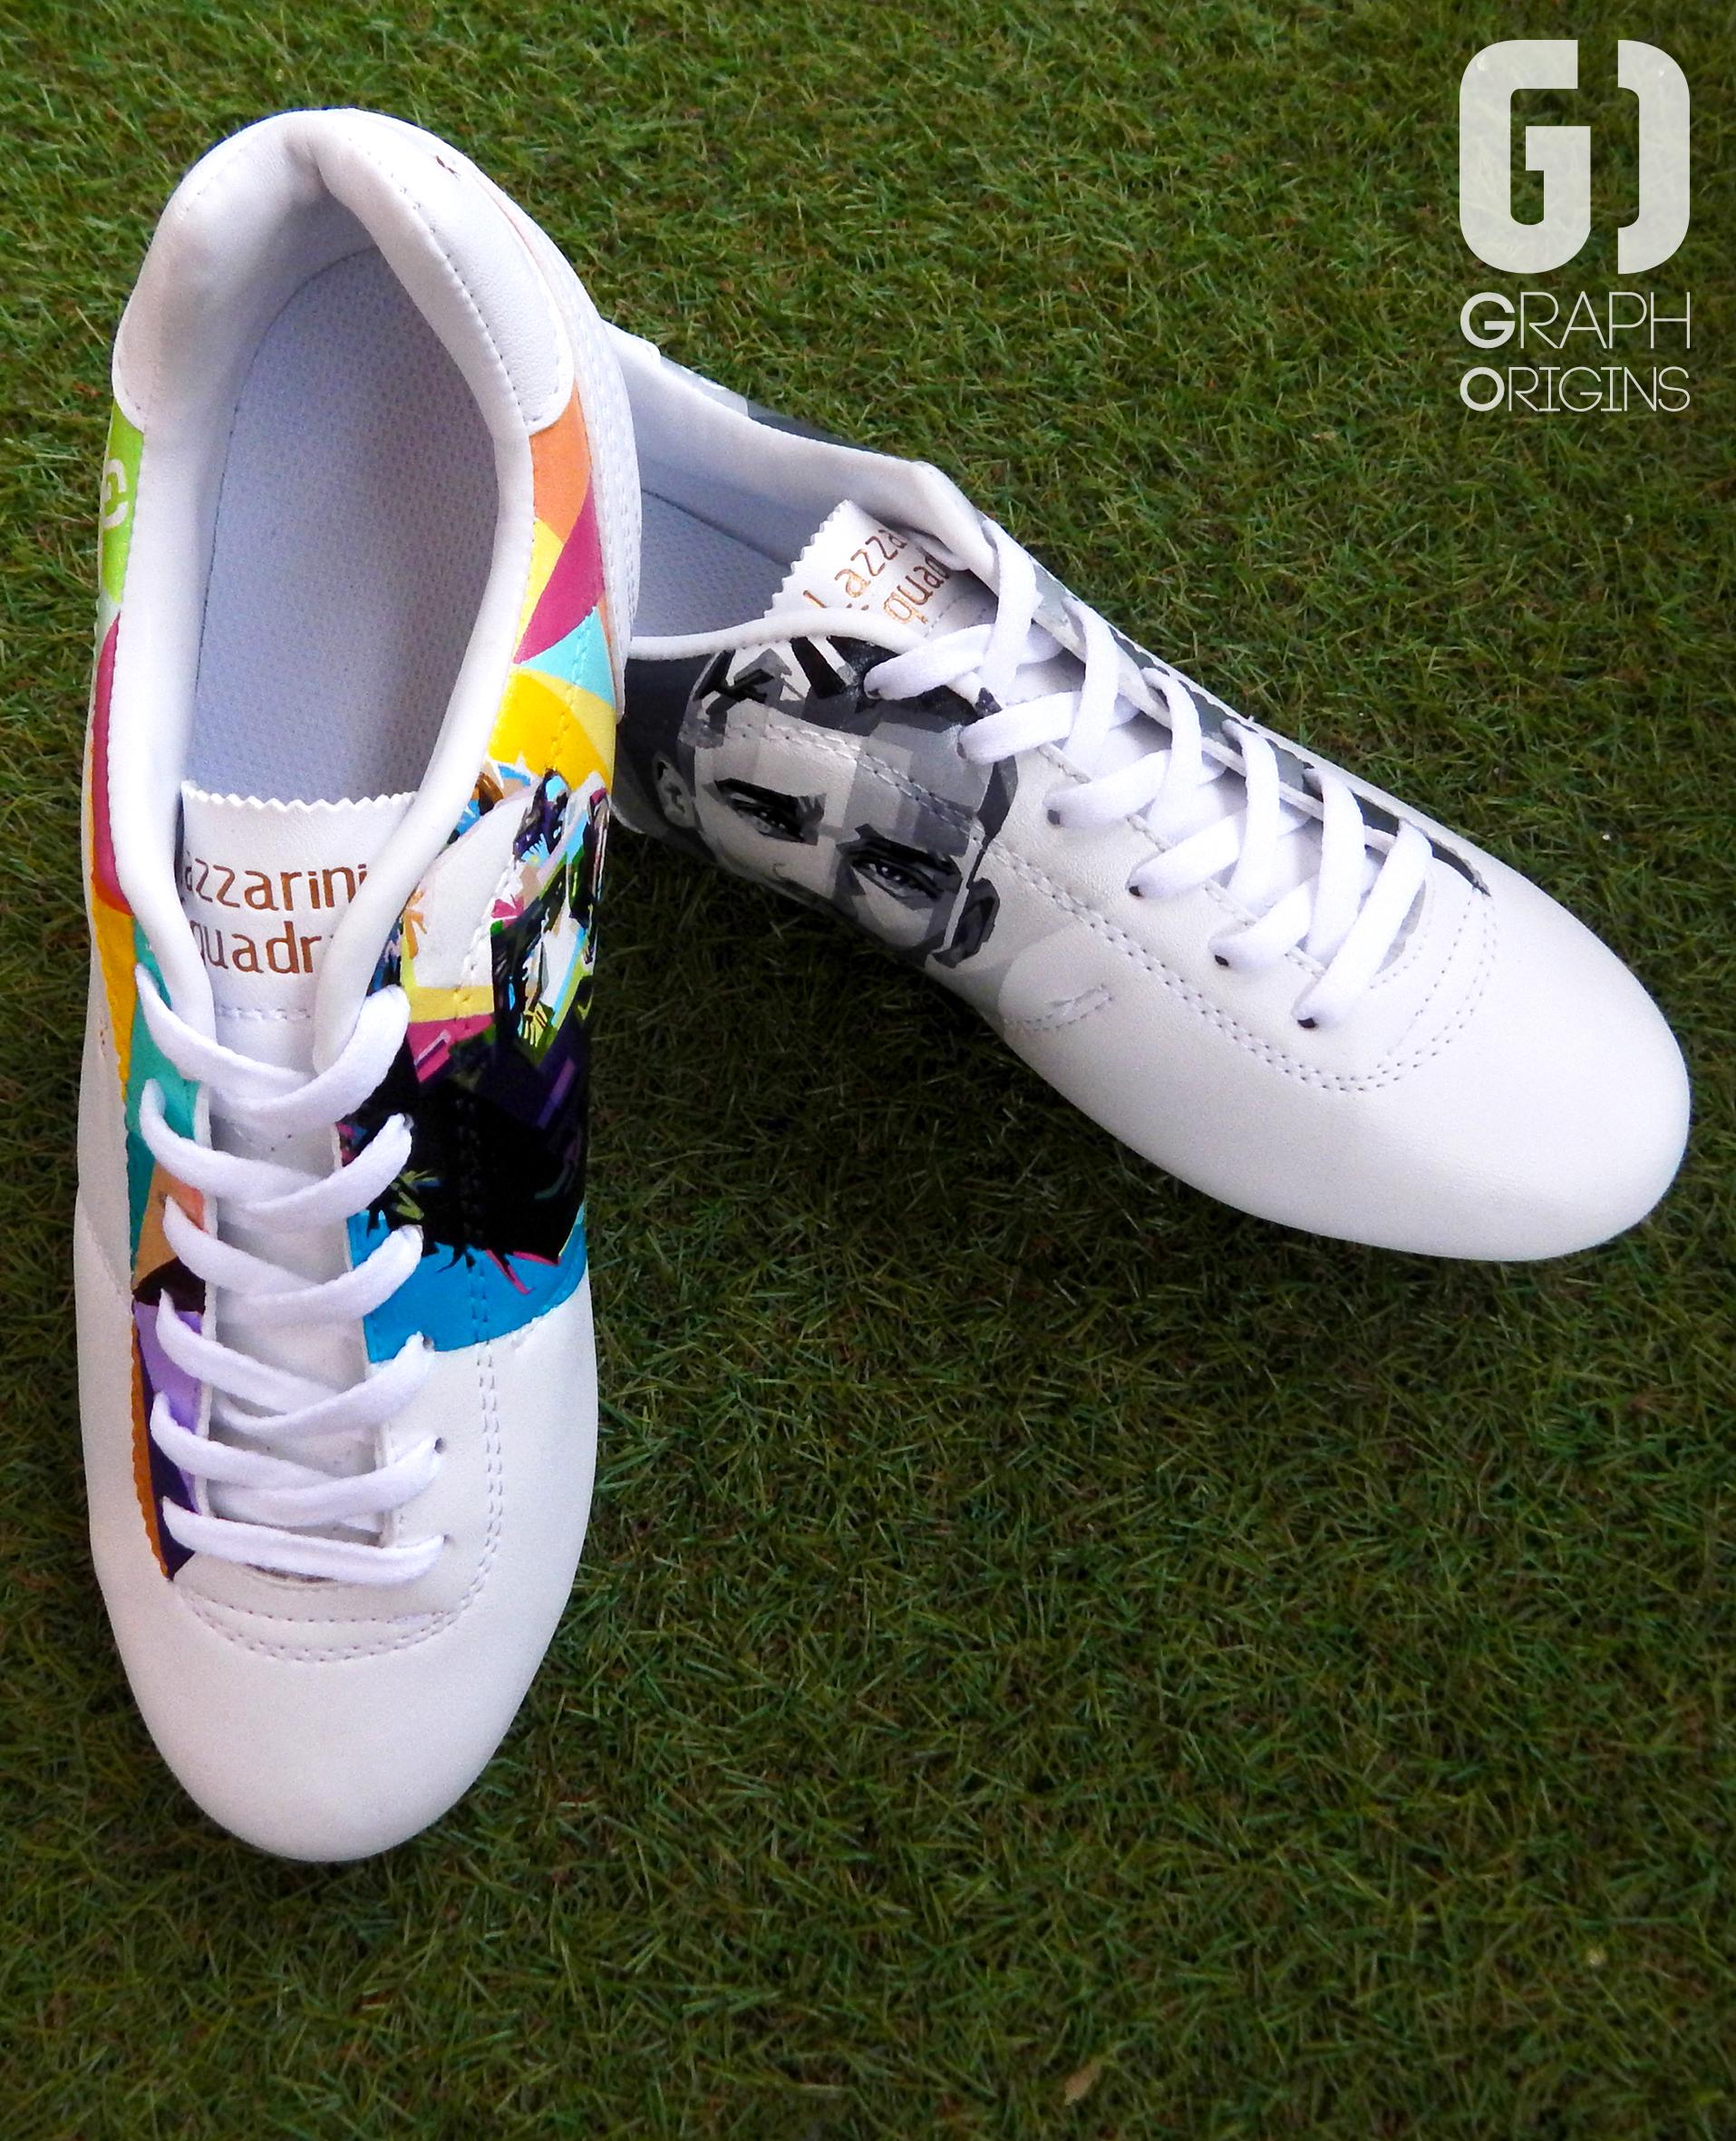 Custom chaussures football pantofola d'oro griezmann graph origins 7